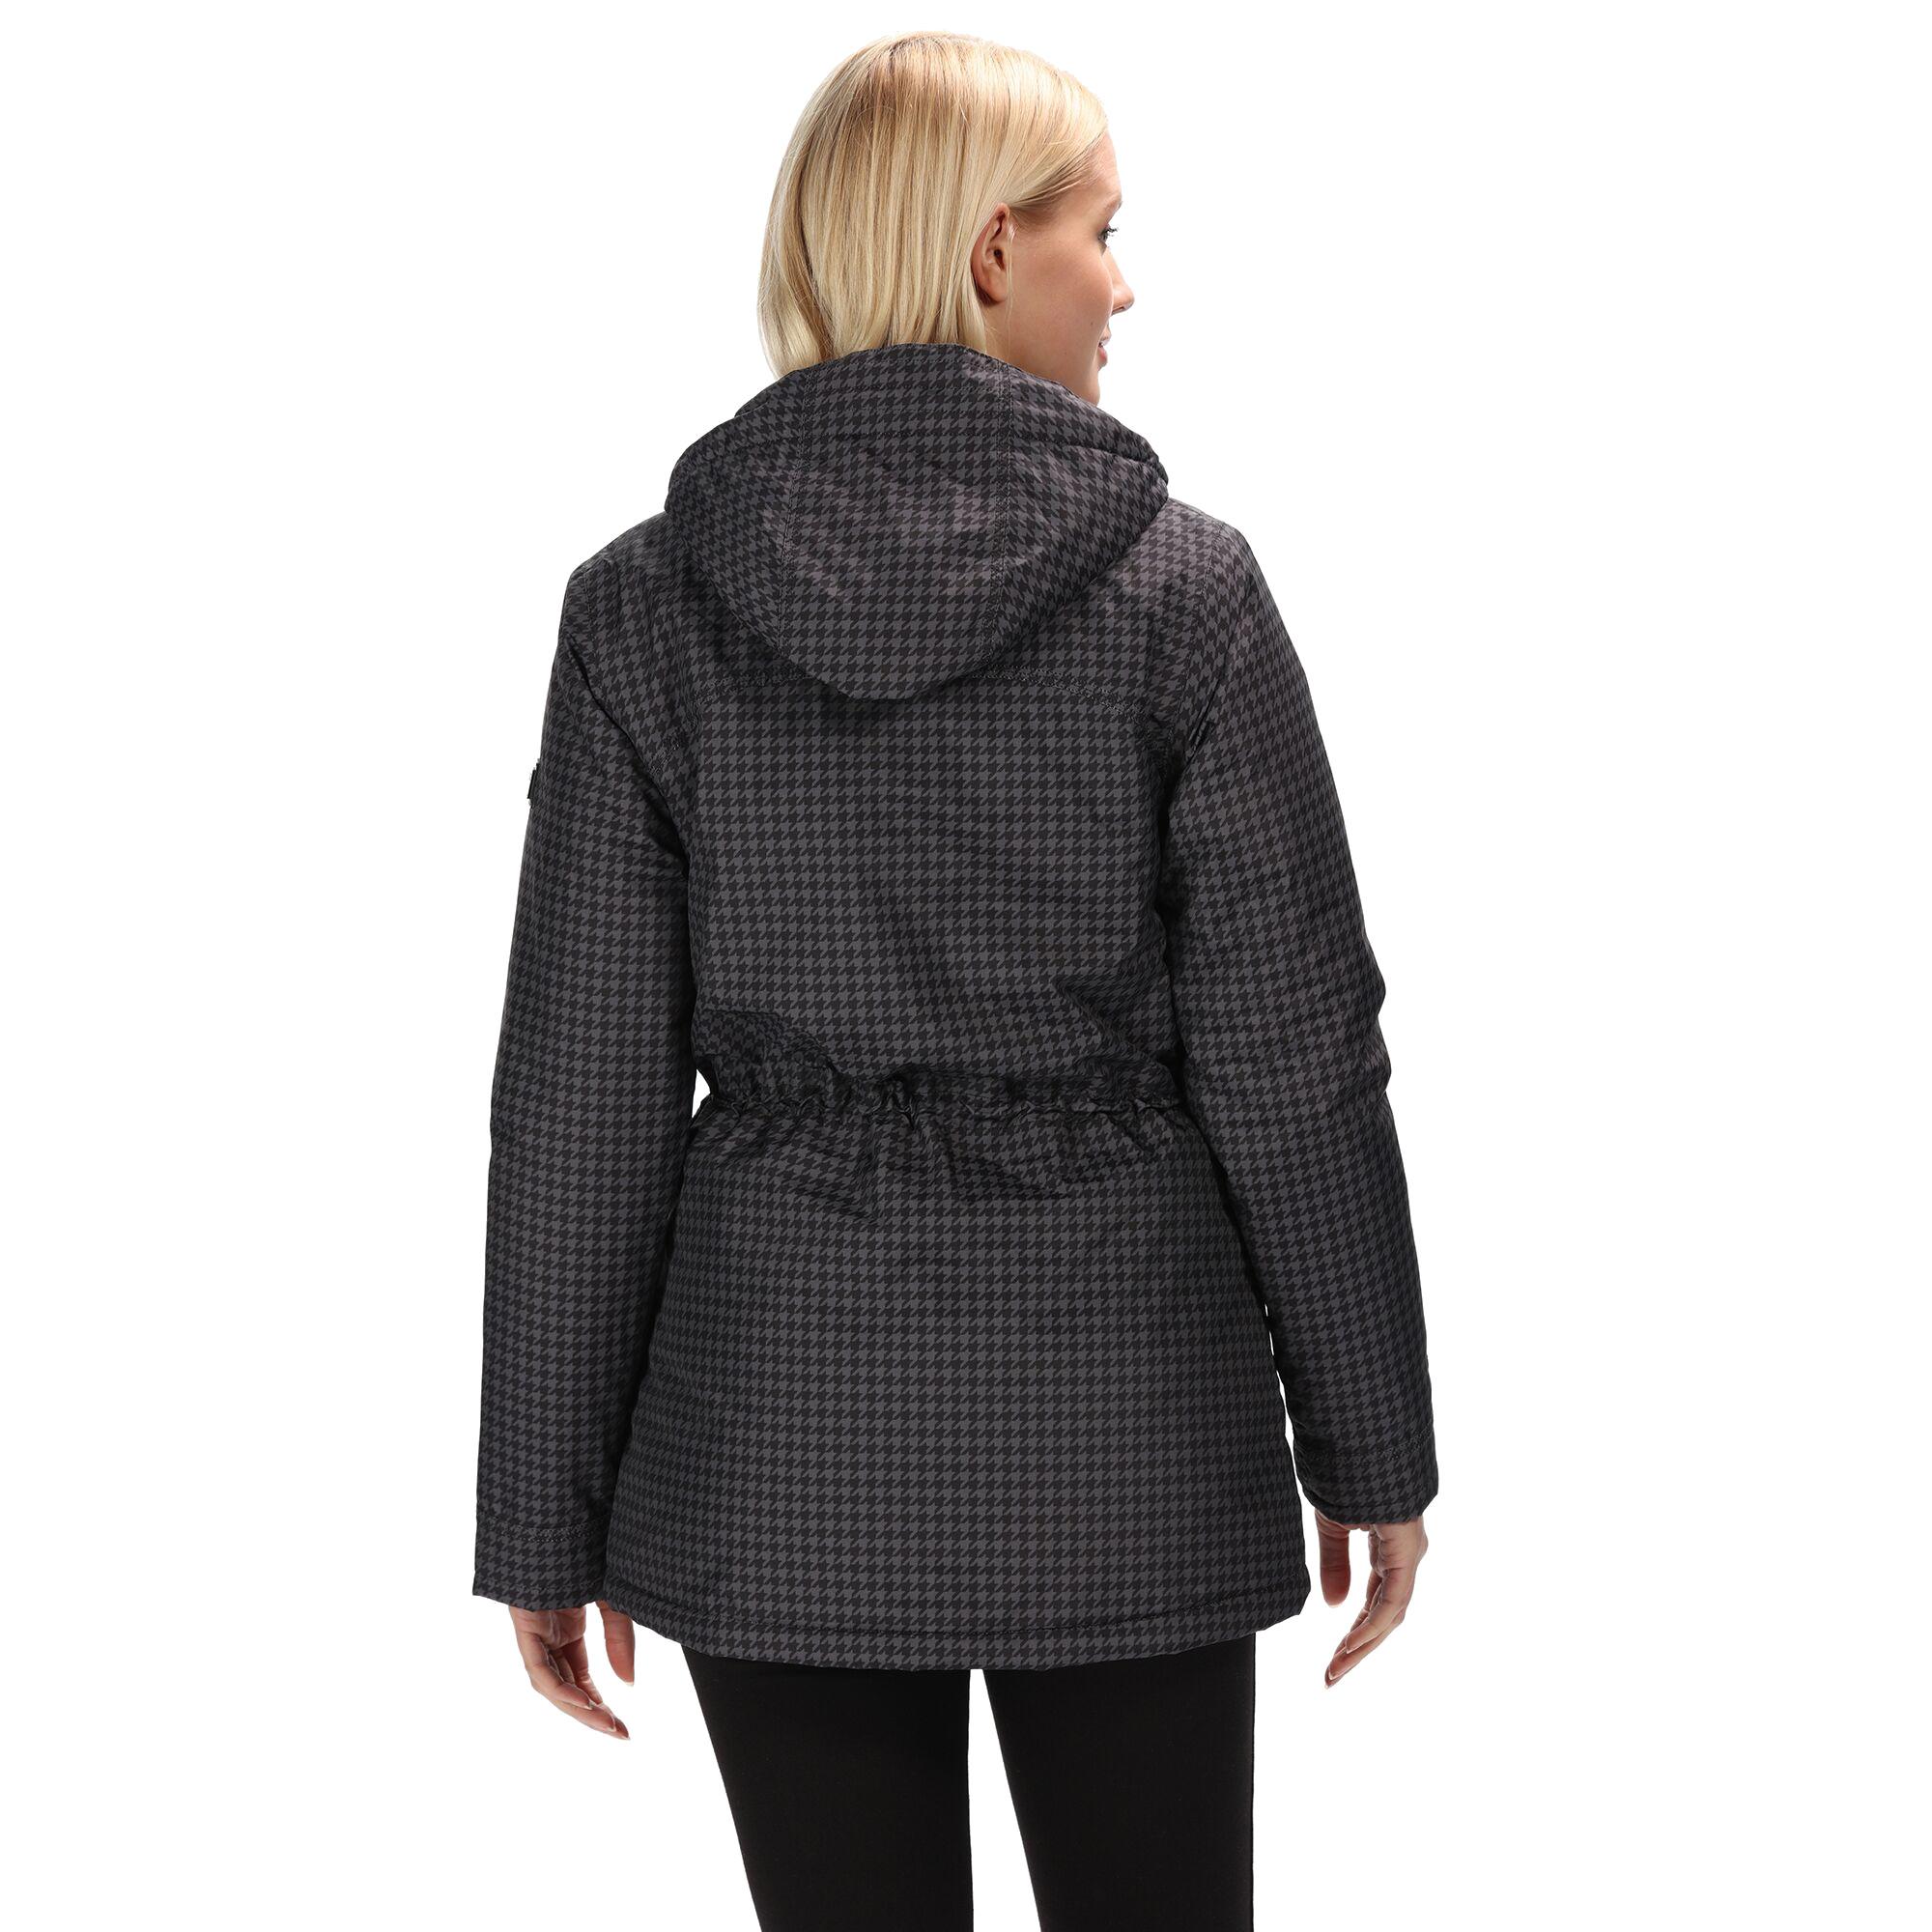 Regatta-Womens-Ladies-Braelynn-Long-Length-Waterproof-Jacket-RG4552 thumbnail 6